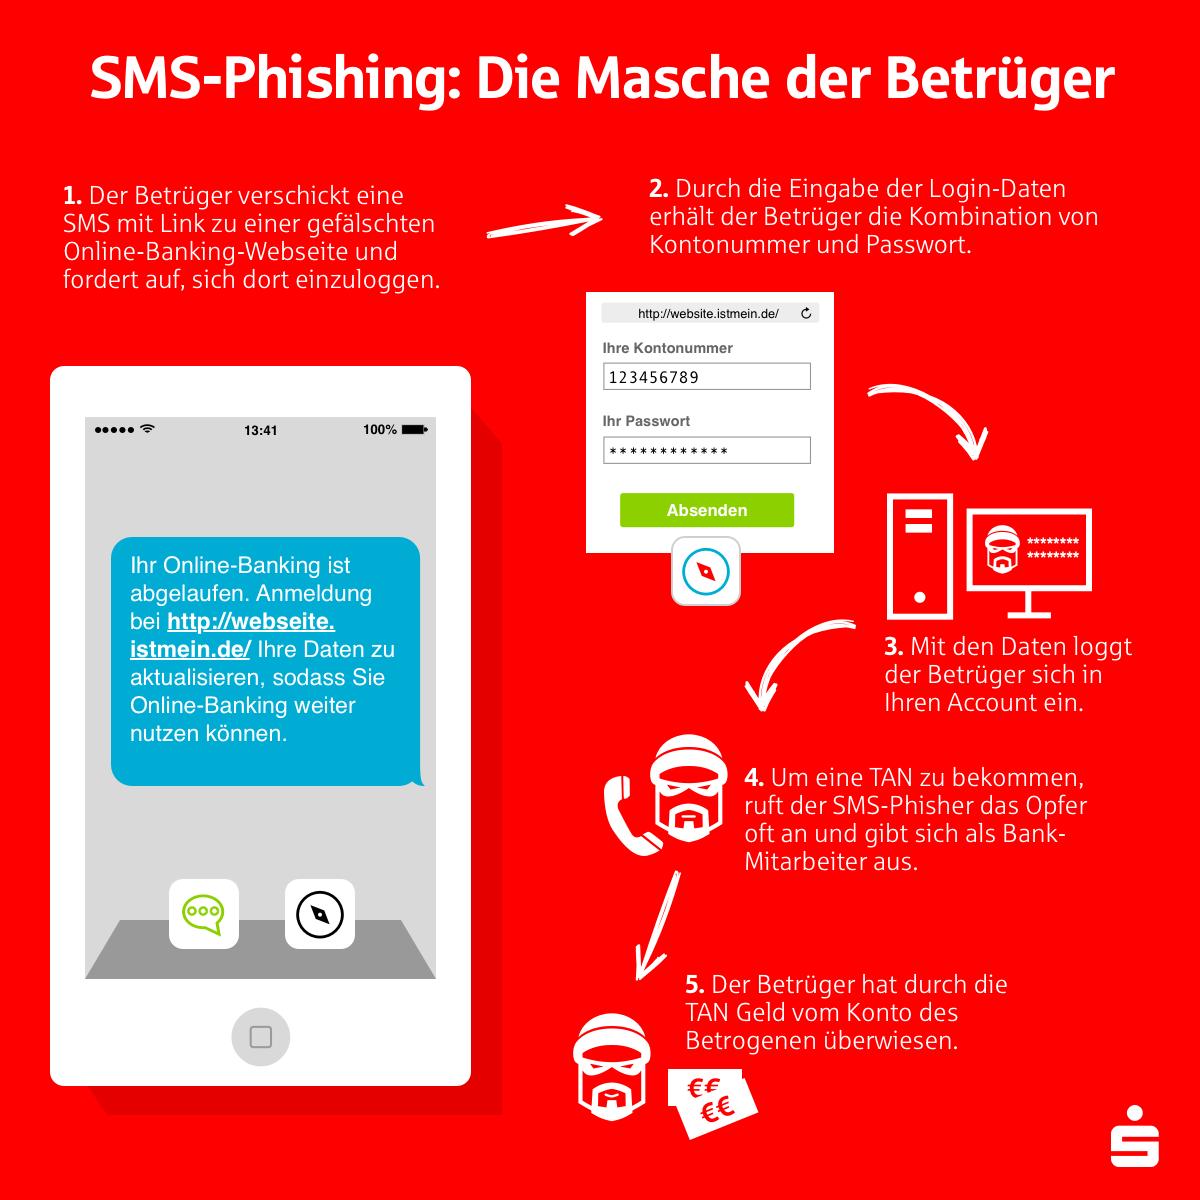 sms-phishing